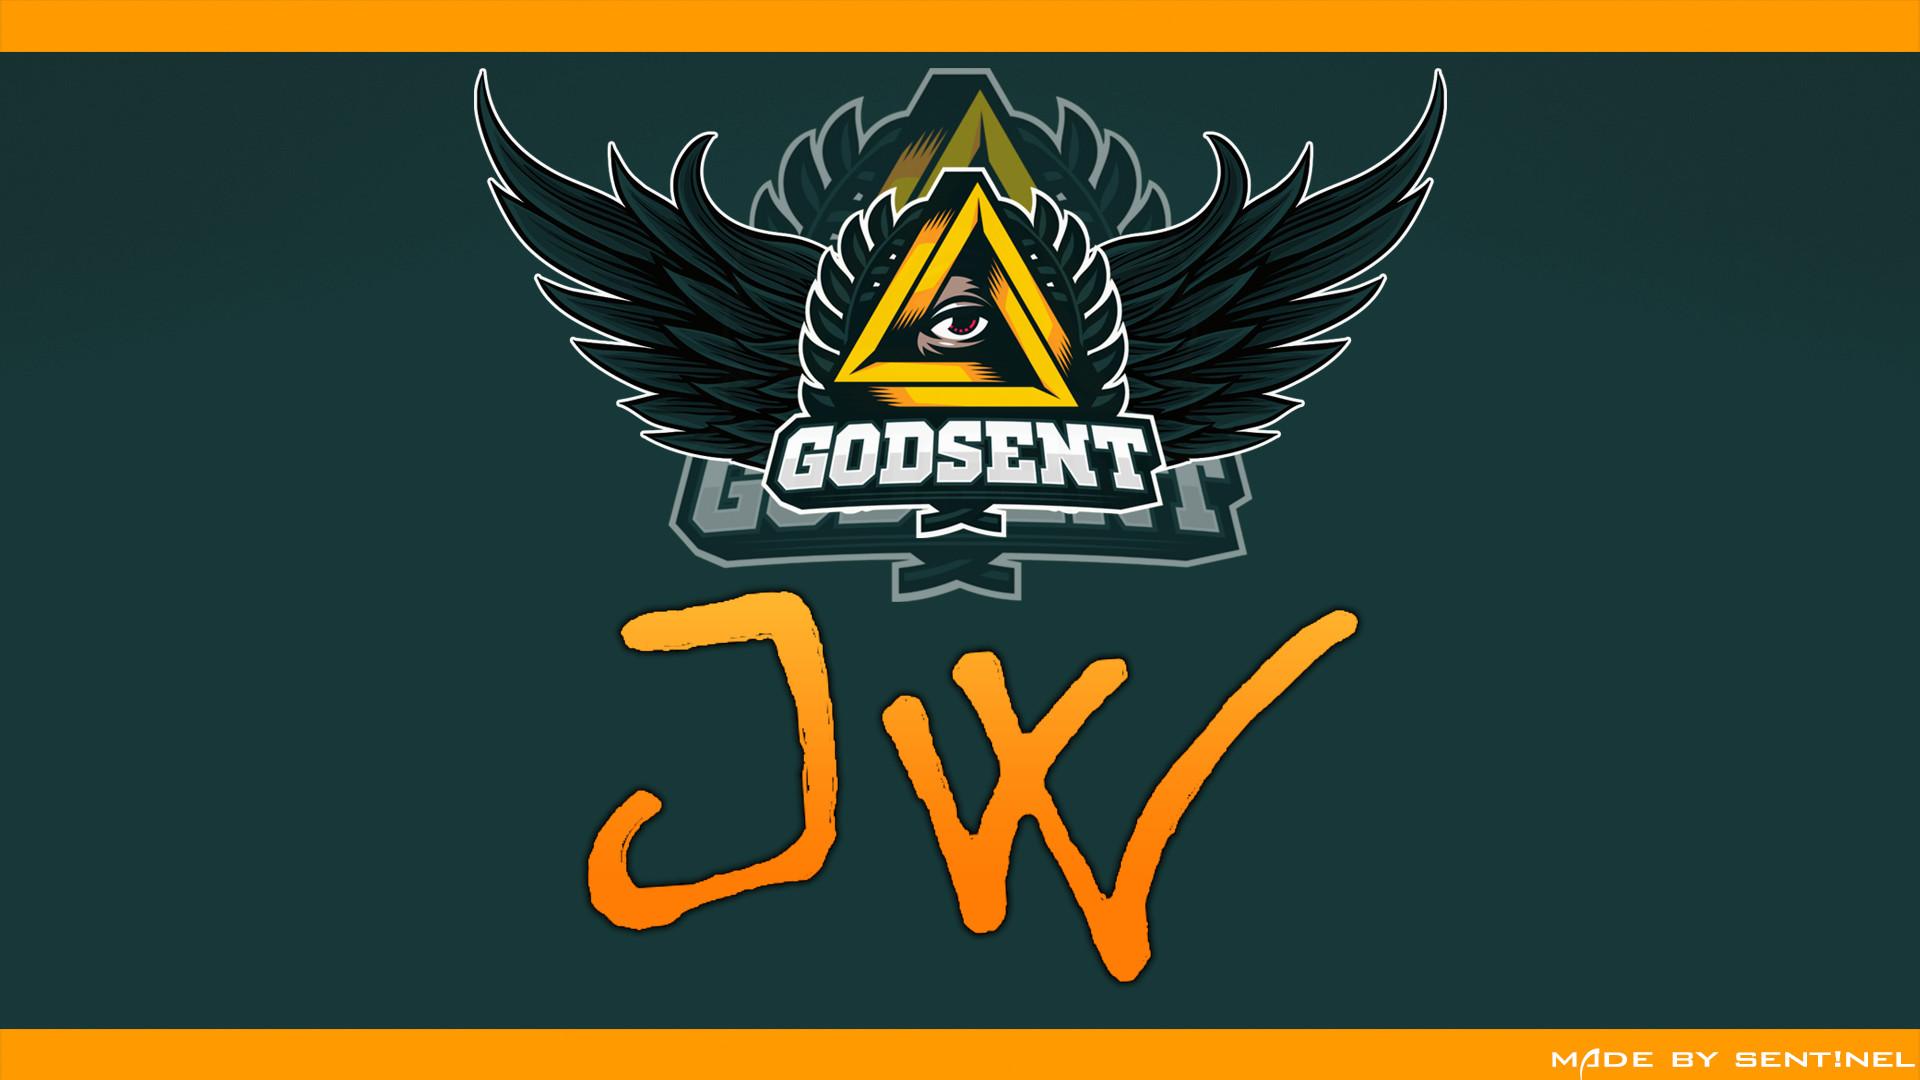 Godsent JW Wallpaper 1920×1080